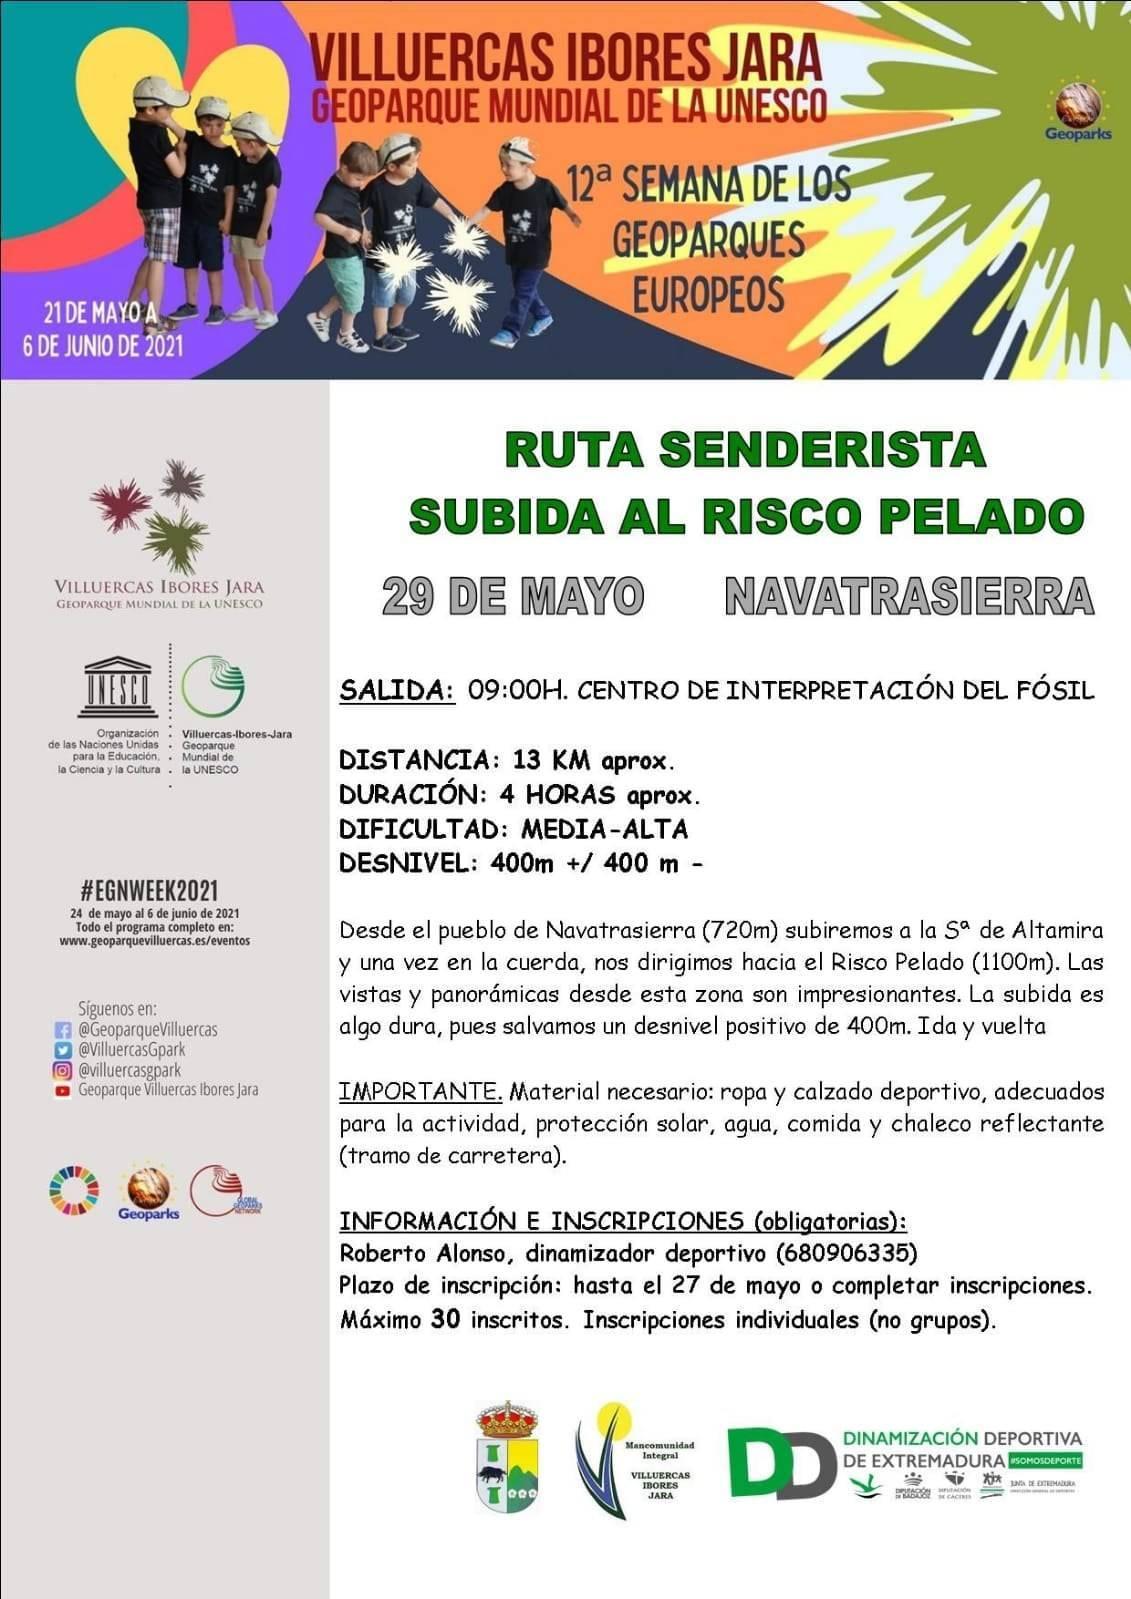 Ruta senderista Subida al risco Pelado (2021) - Navatrasierra (Cáceres)